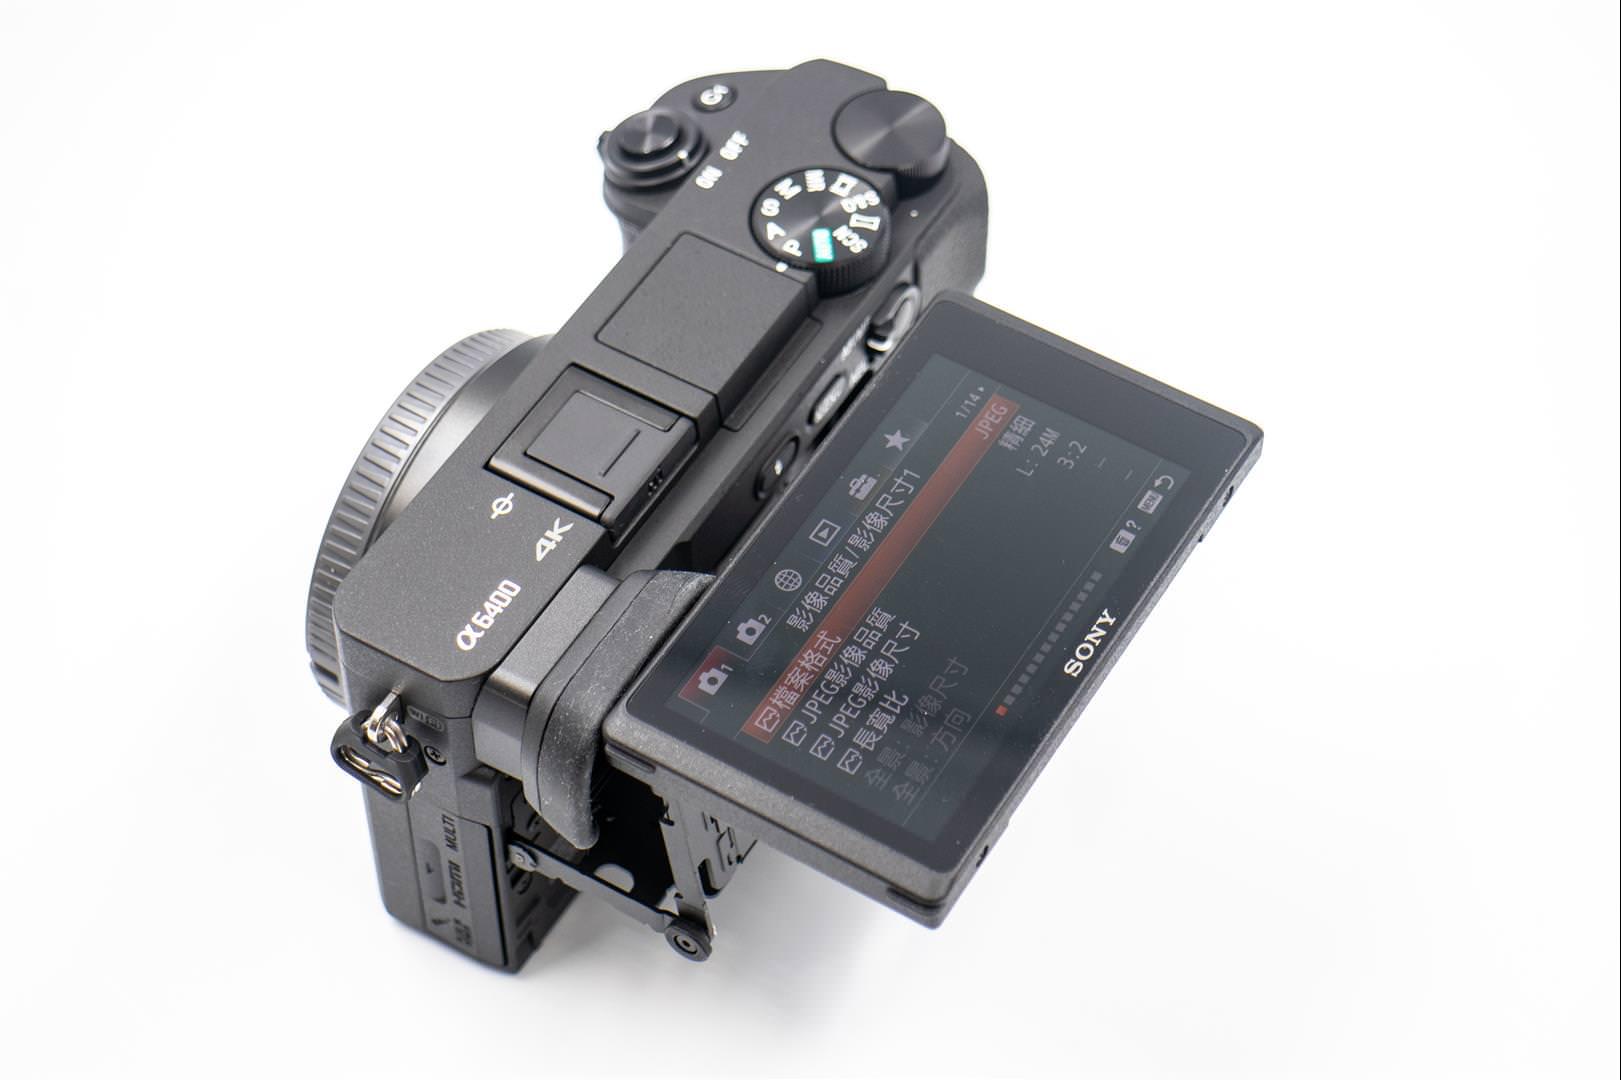 Sony A5100 Vs A6000 Reddit